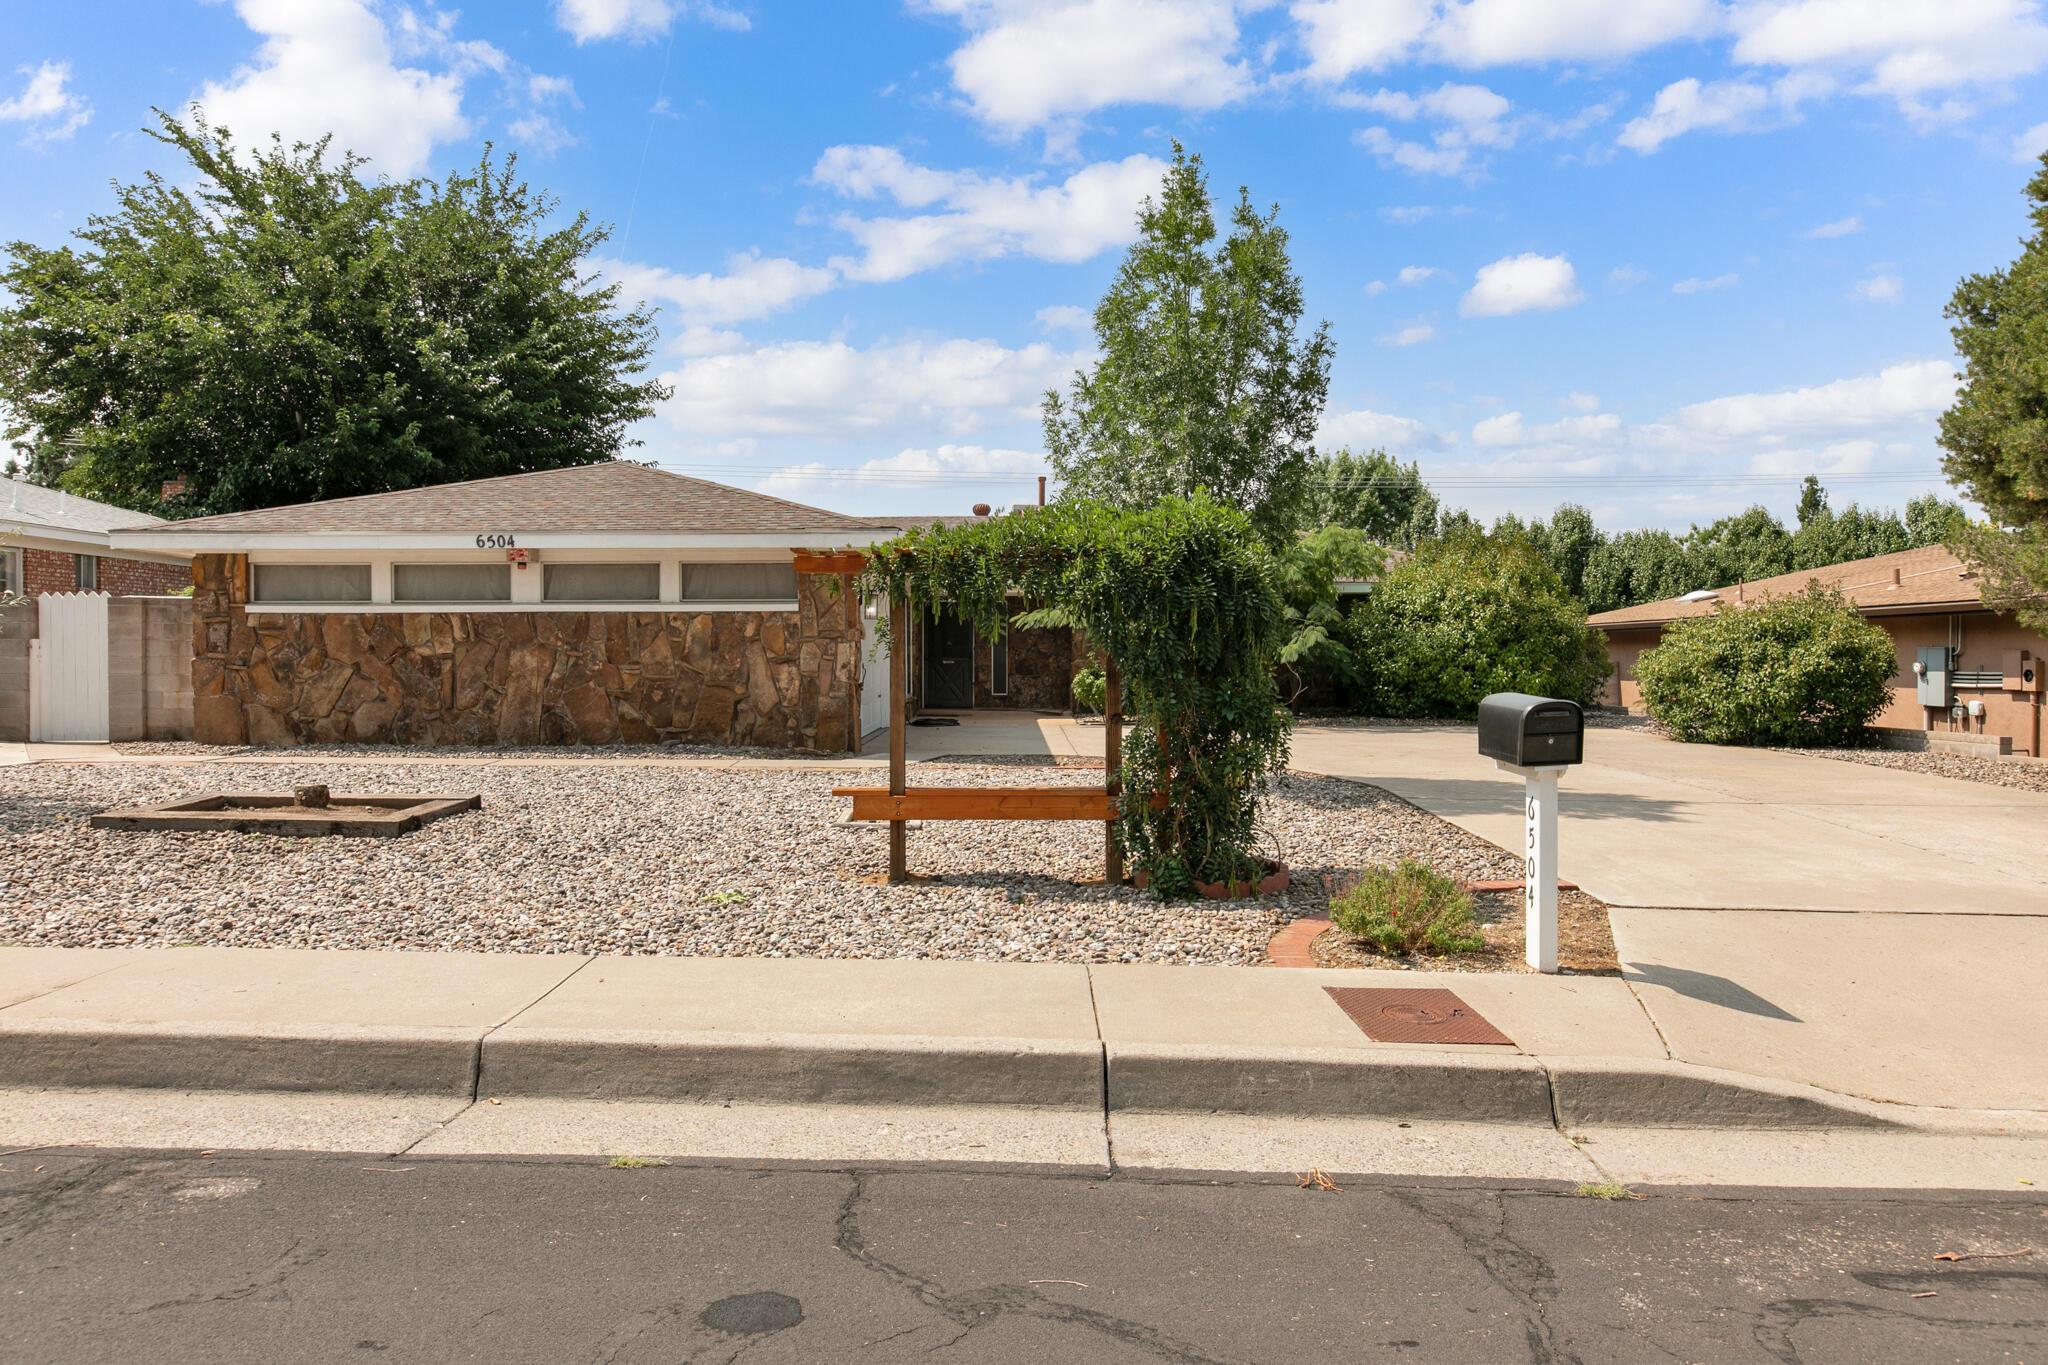 6504 BAKER Avenue, Albuquerque NM 87109